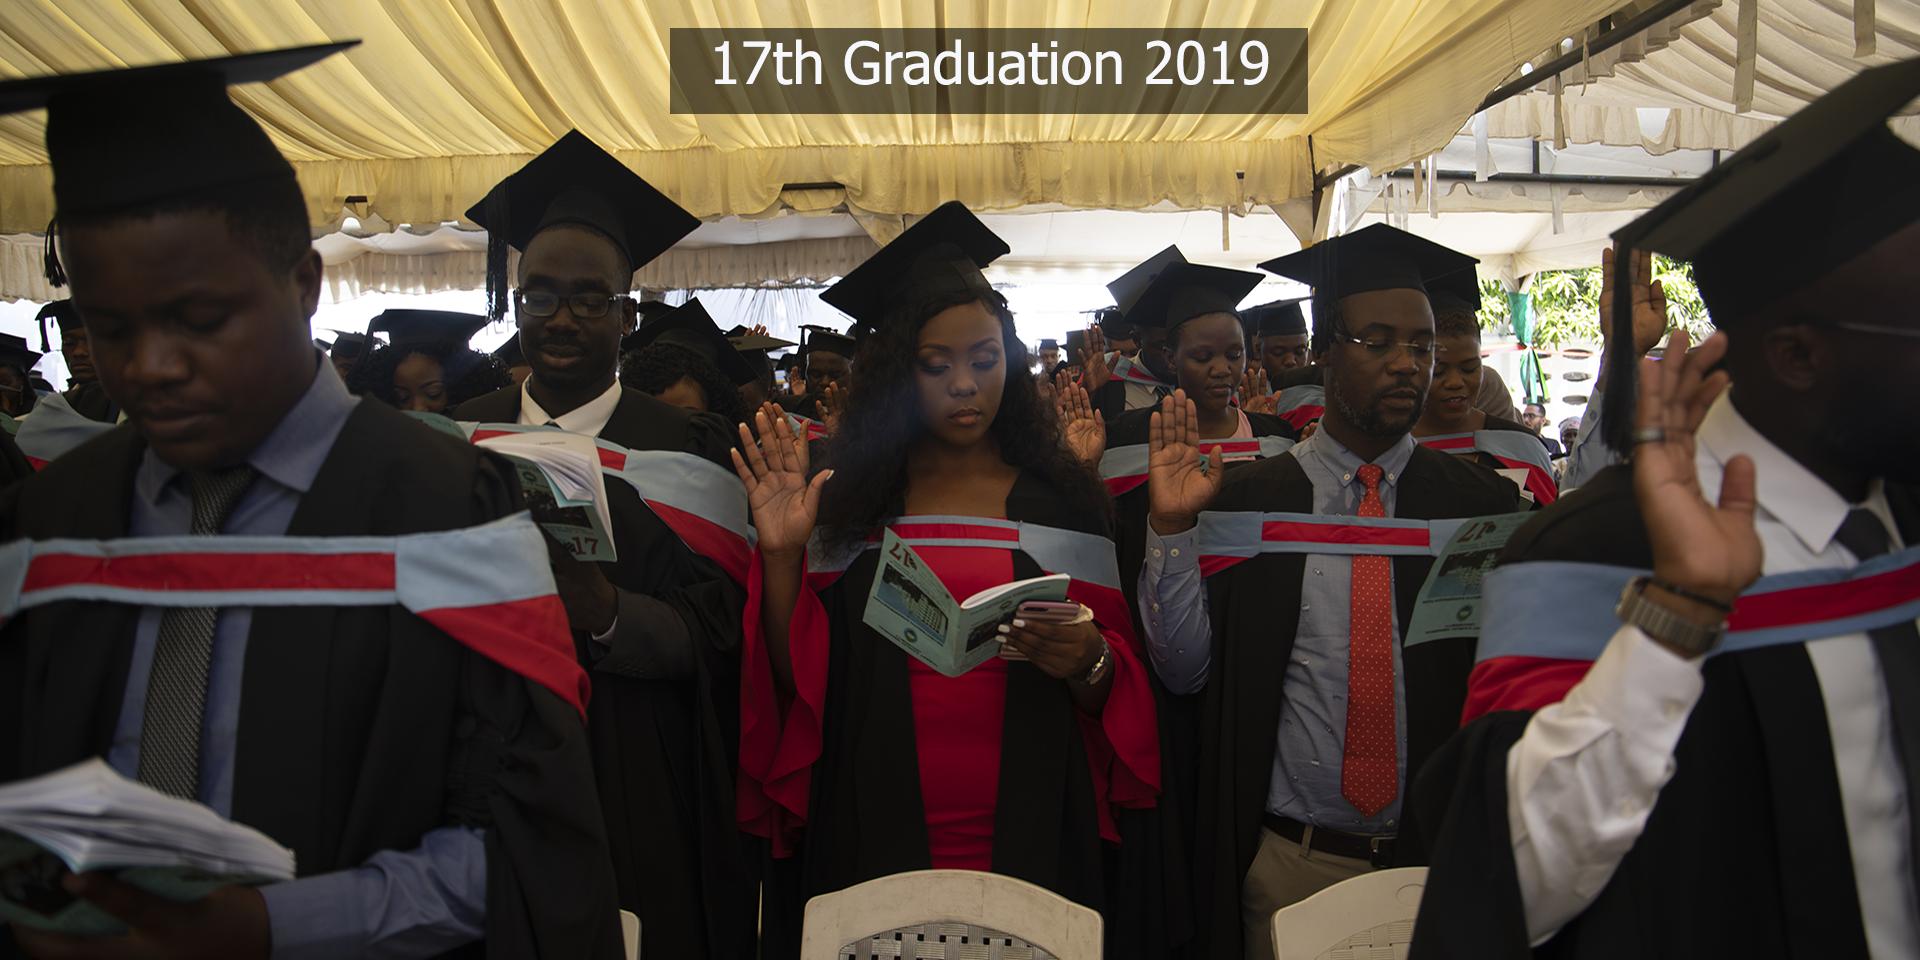 17th-Graduation-2019